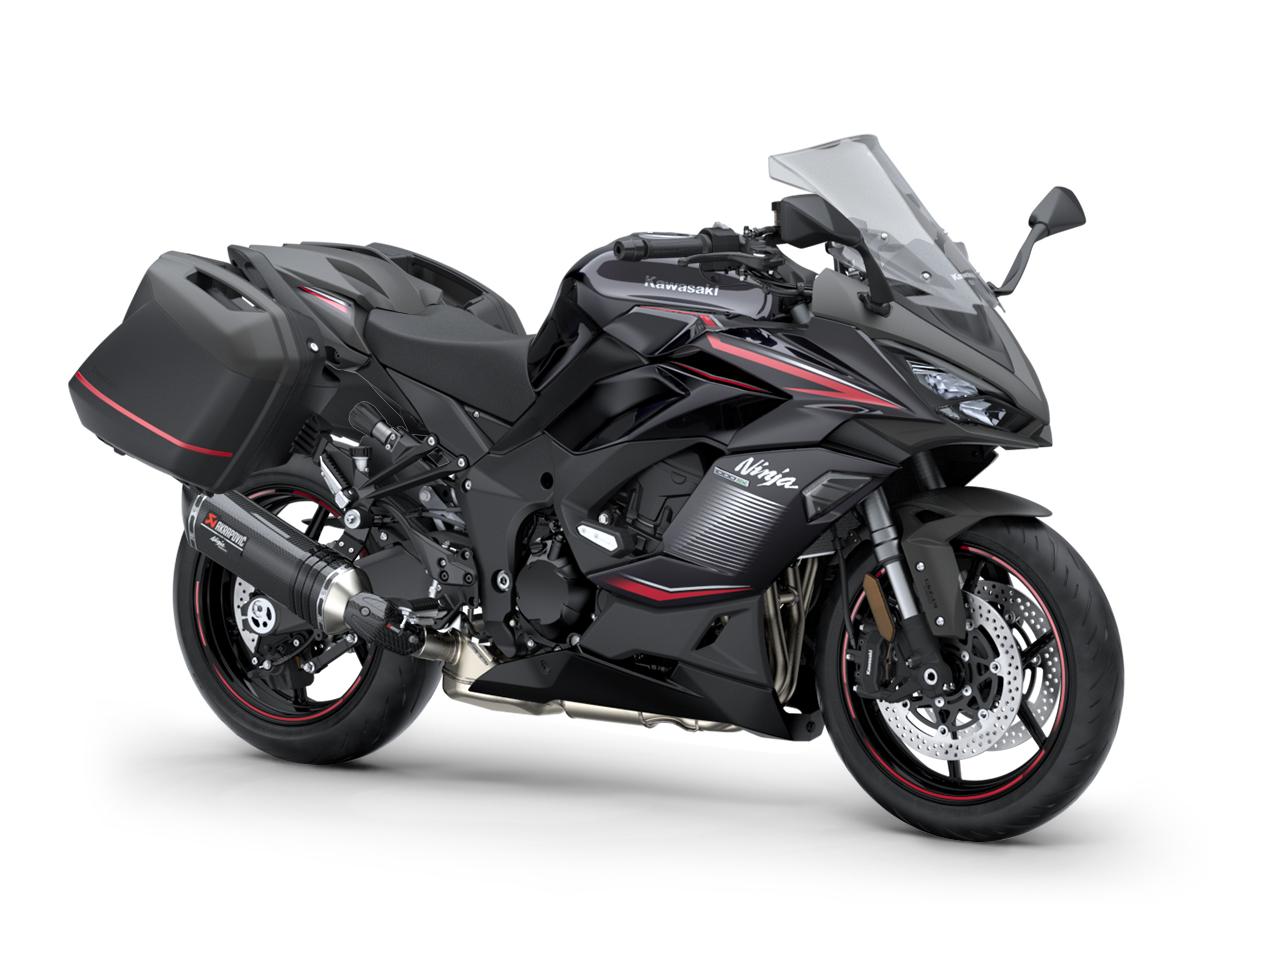 2022 Ninja 1000SX  Performance Tourer